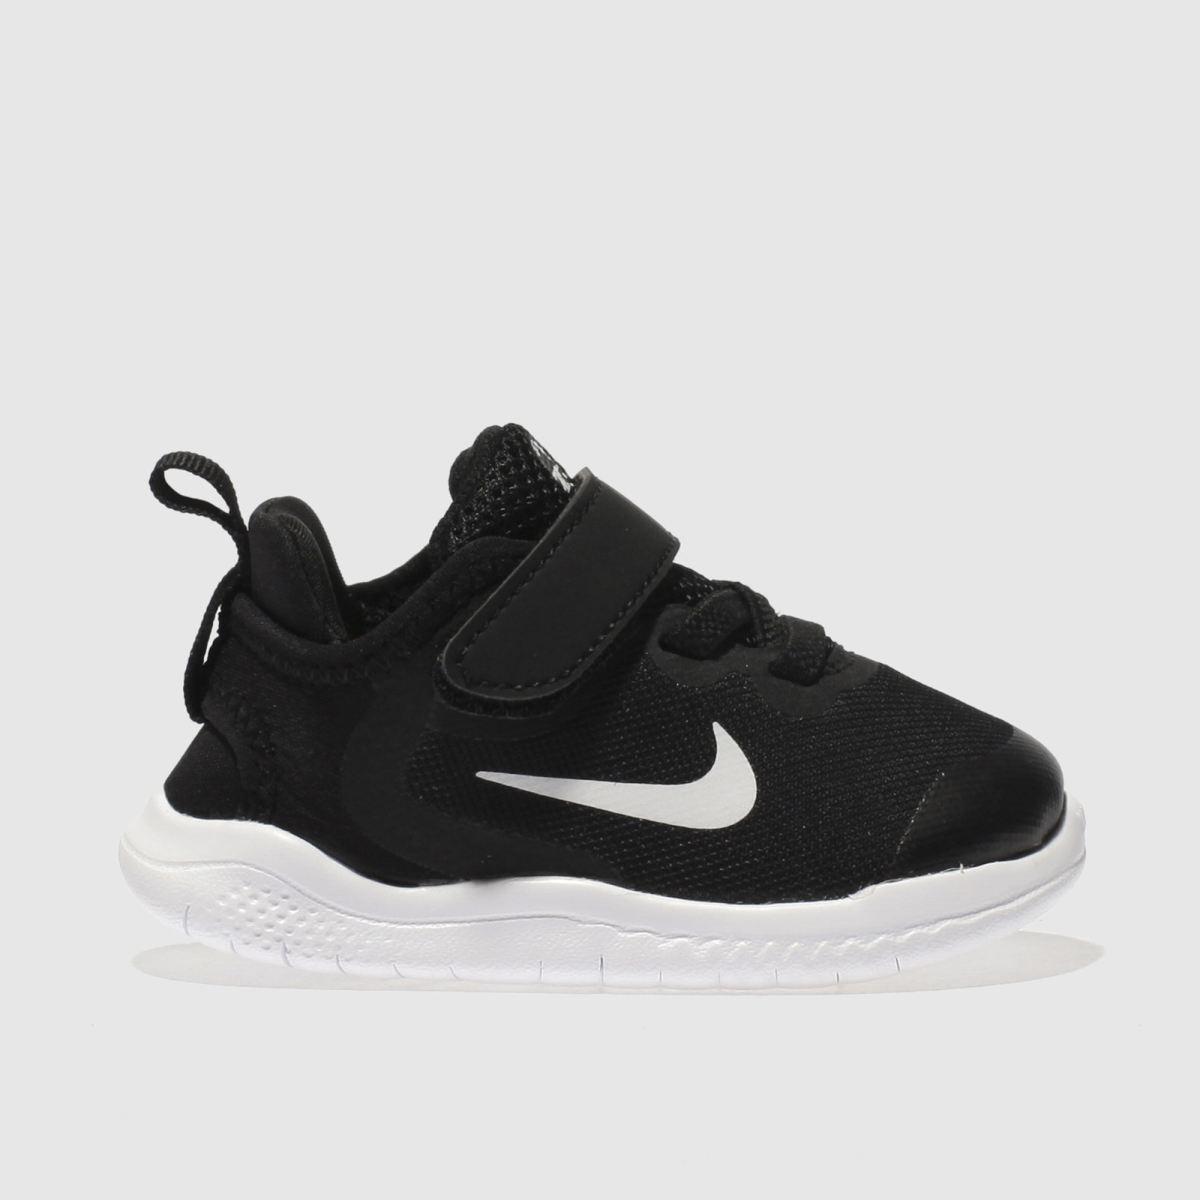 Nike Black & White Free Rn 2018 Trainers Toddler